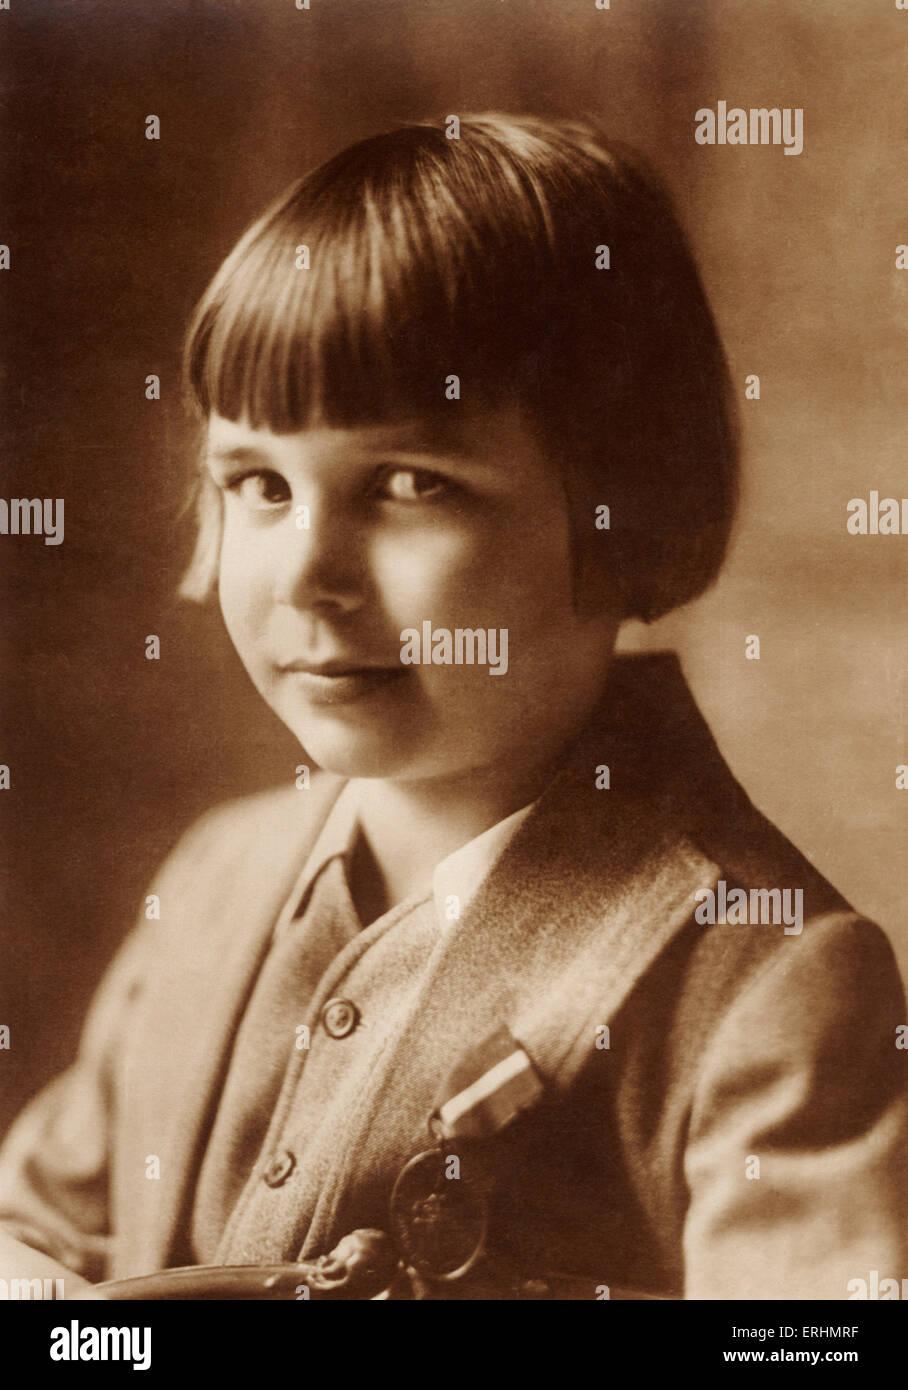 John Leslie (Jackie) Coogan - American actor. Began career as a child star in silent films.  Series called: Les - Stock Image